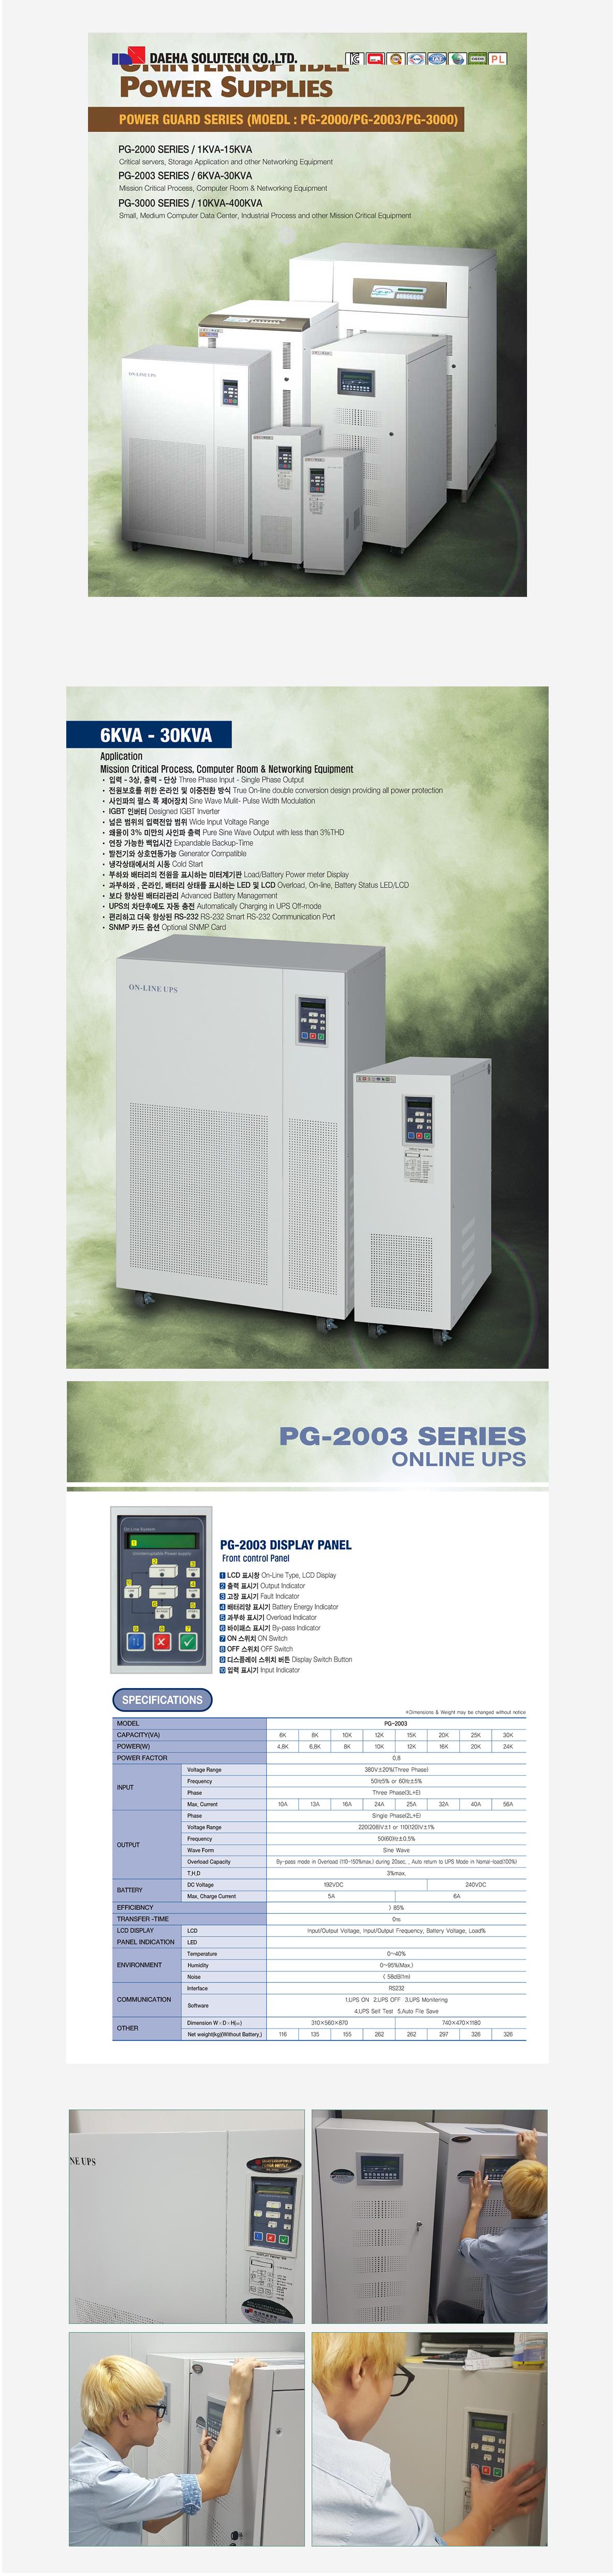 Daeha Solutech UPS (Uninterruptible Power Supply) PG-Series 1